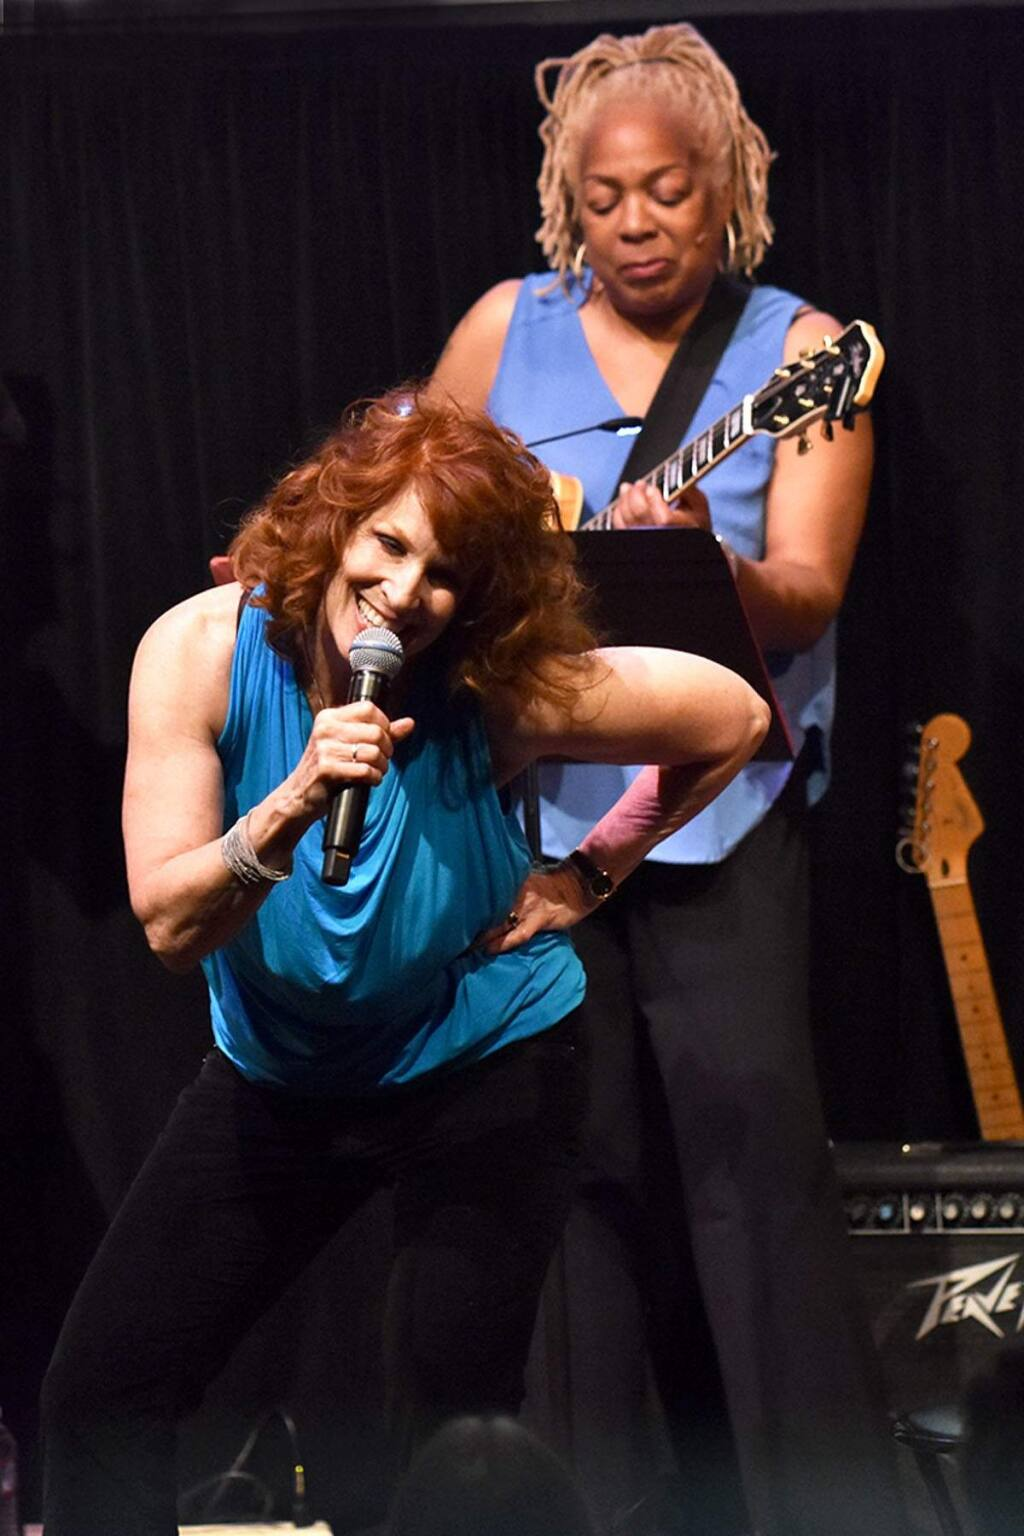 L to R: Pat Wilder (guitar), Pamela RosePHOTO CREDIT: JANE HIGGINS